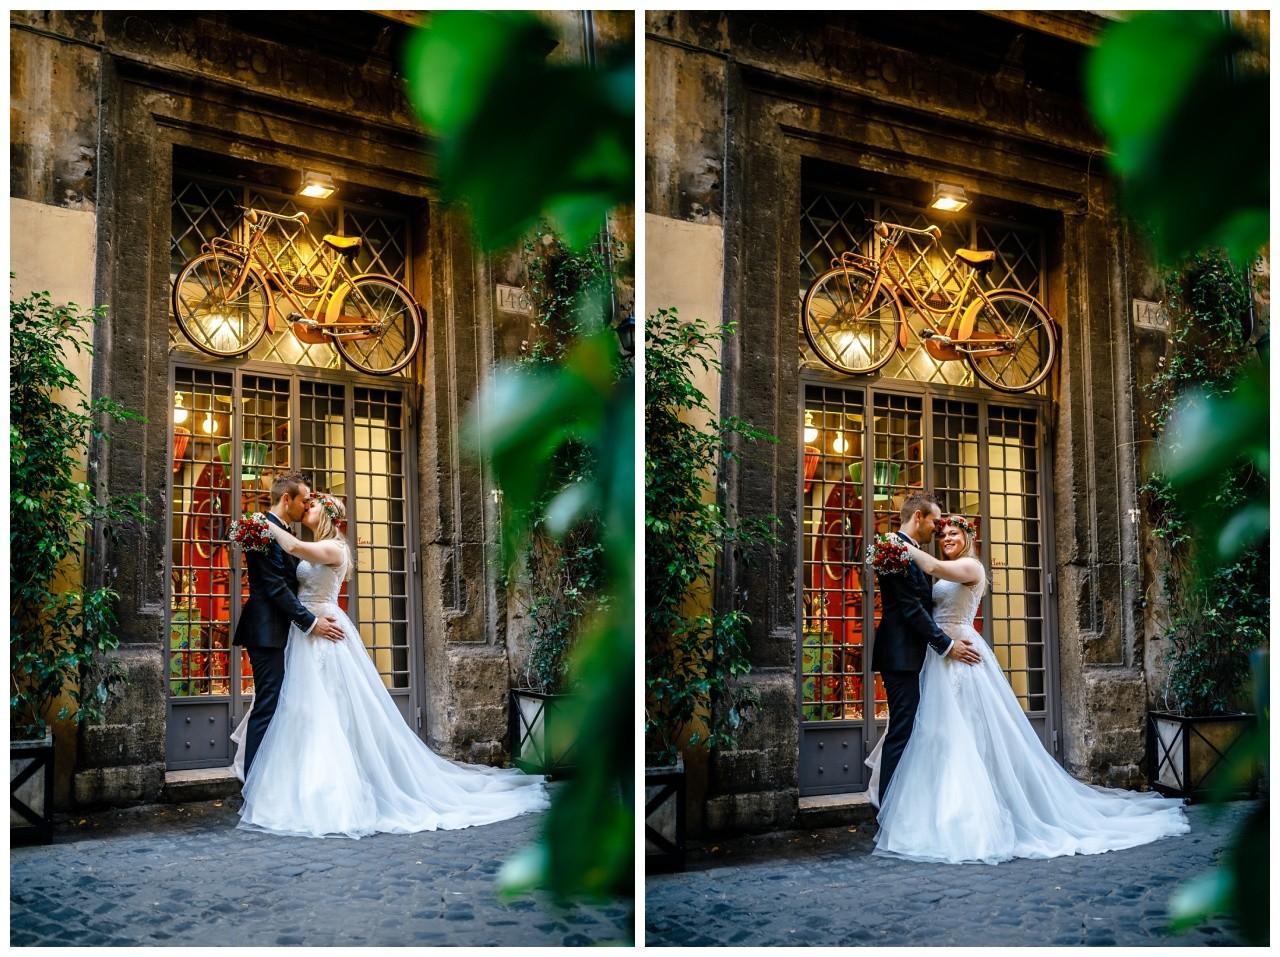 Hochzeitsfotos Rom After Wedding Shooting Hochzeitsfotograf Italien 01 - After Wedding Shooting in Rom